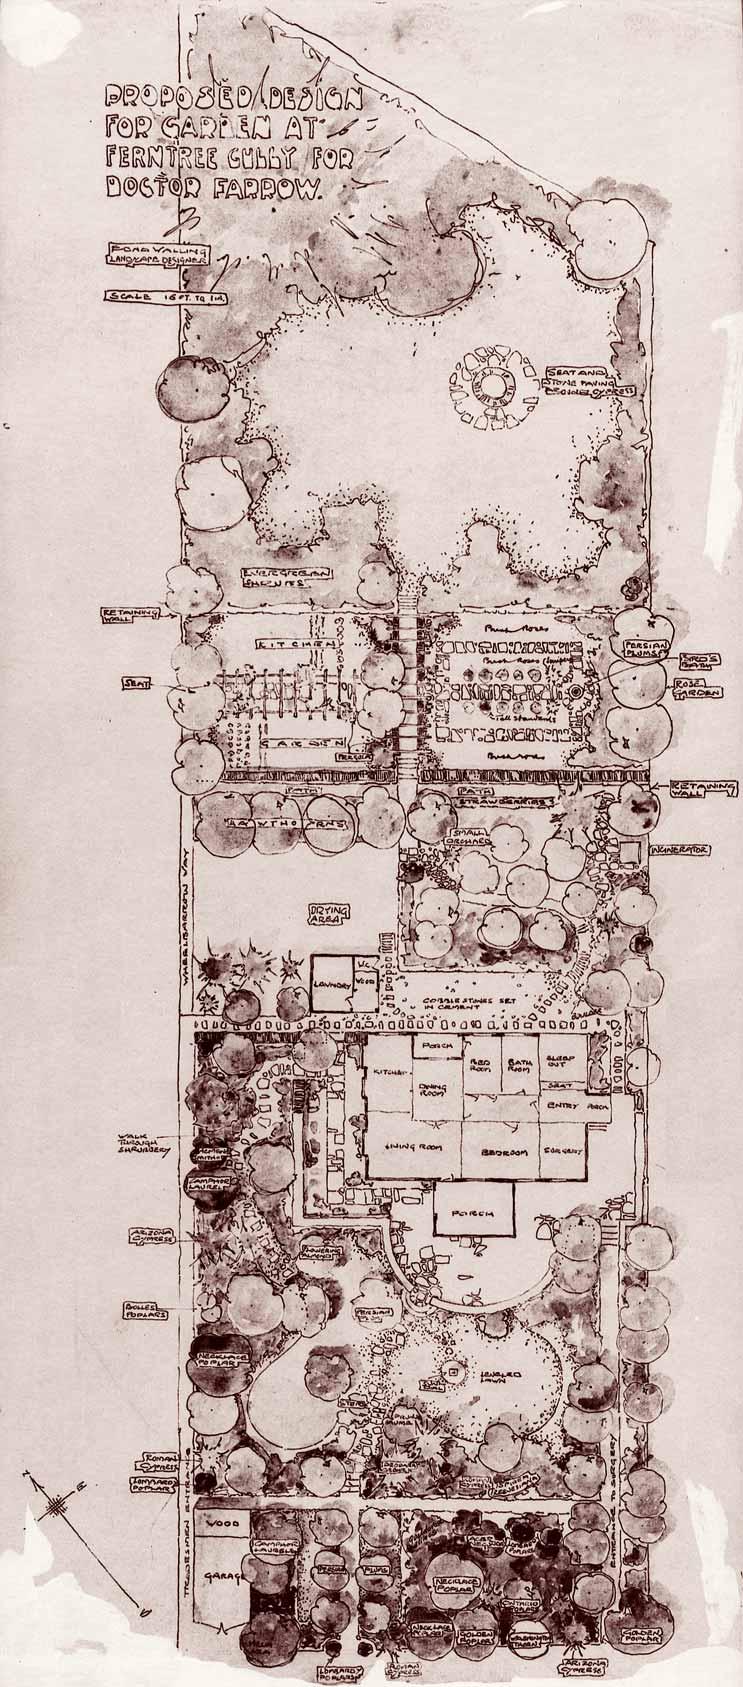 Proposed garden design plan farrow for Garden planner australia